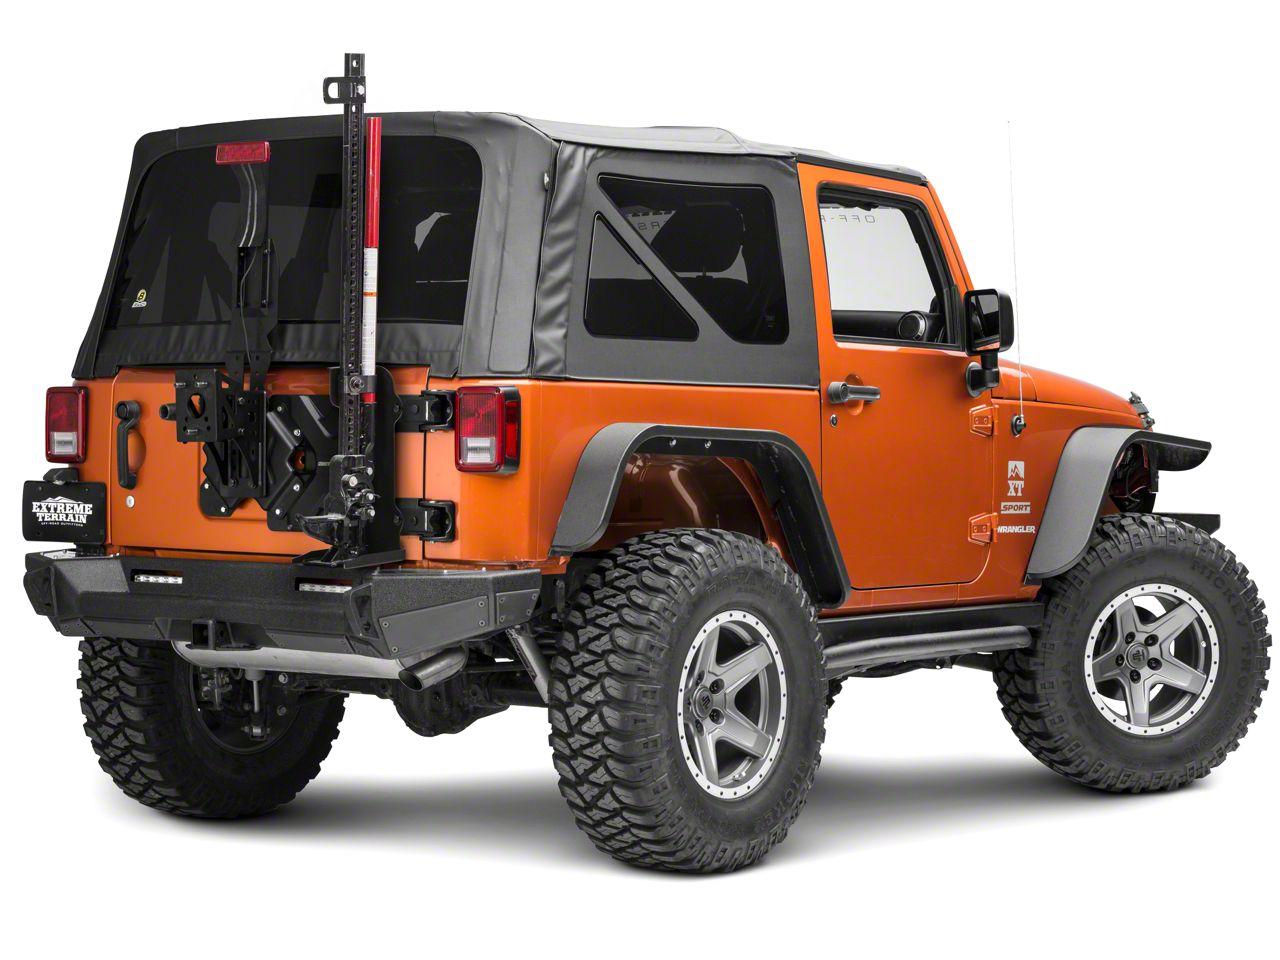 Smittybilt Trail Jack Mount (07-18 Jeep Wrangler JK)